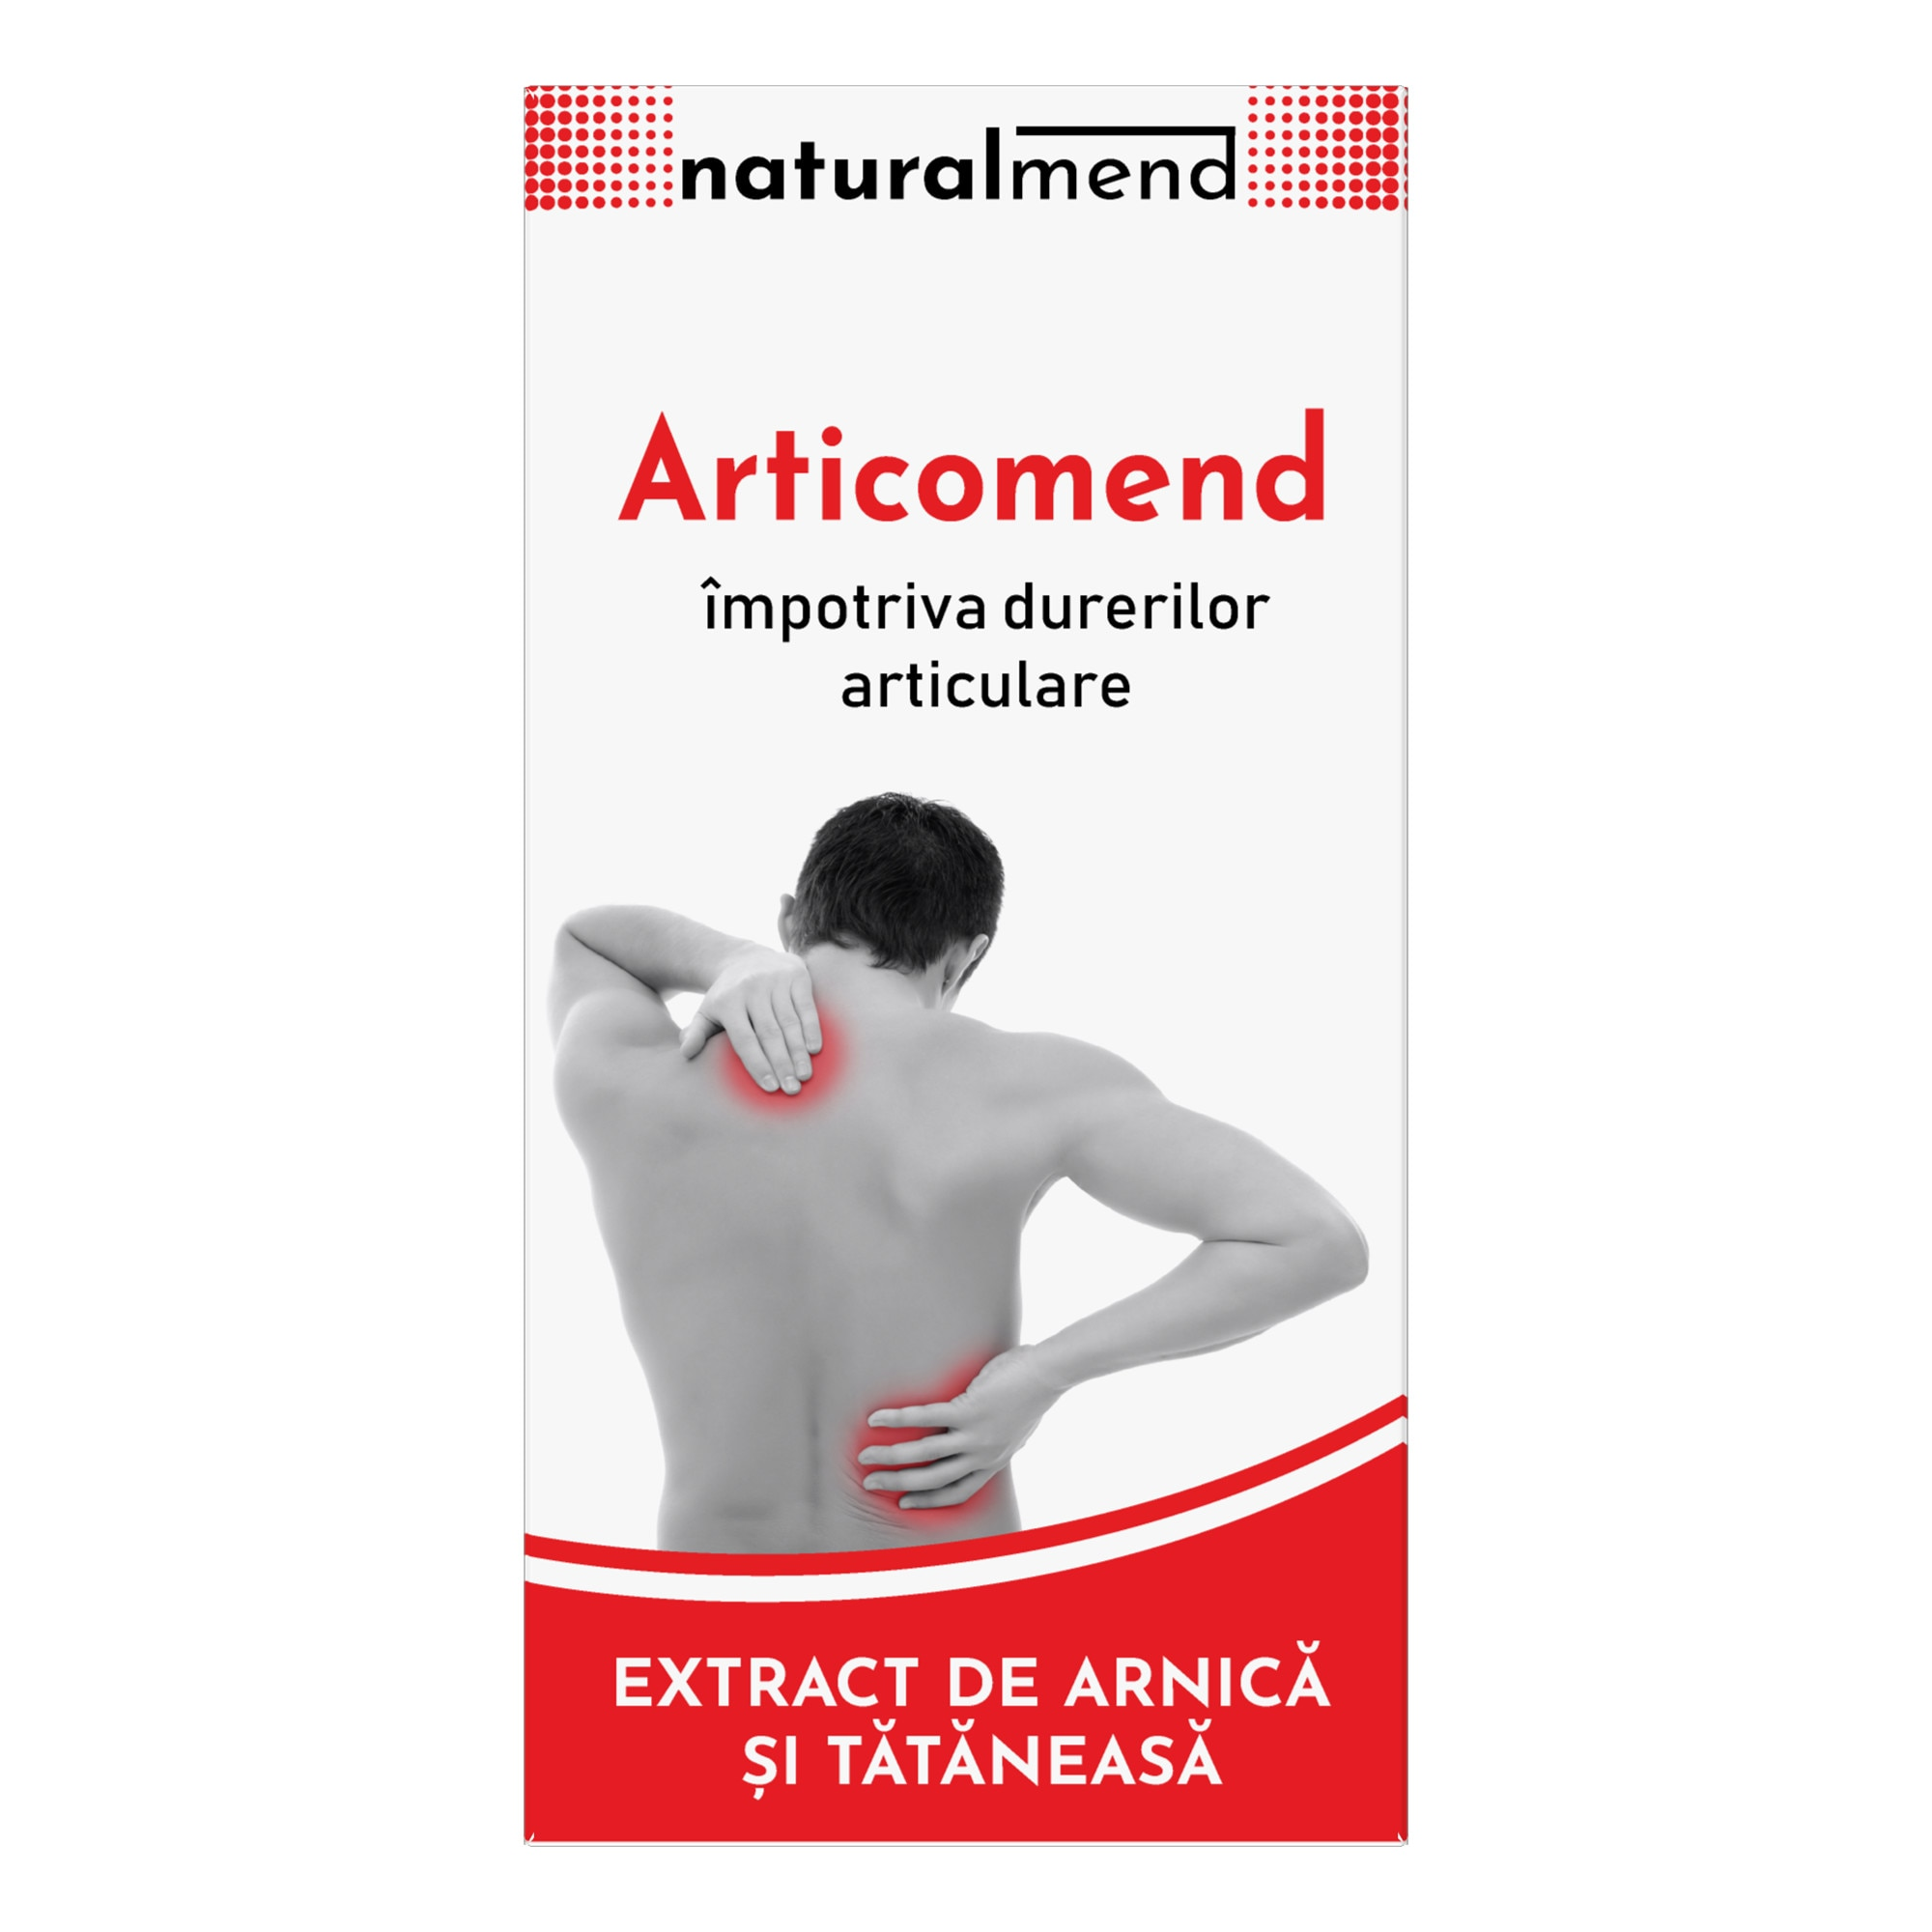 lekkos crema balsam pentru dureri articulare periodic dureri la nivelul gleznei